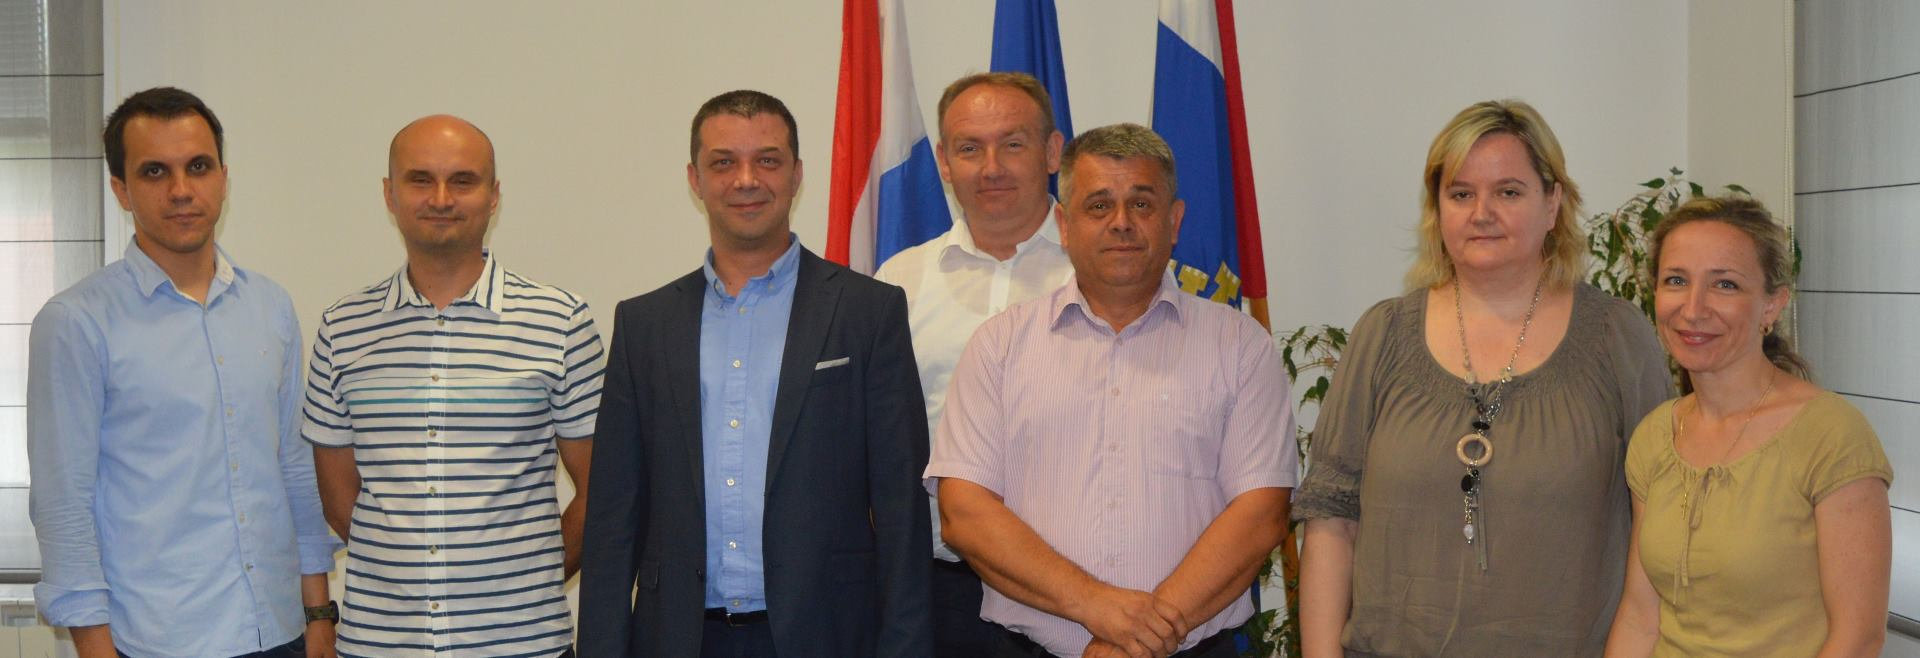 Grad Novska postao grad modernih tehnologija – 'smart city'